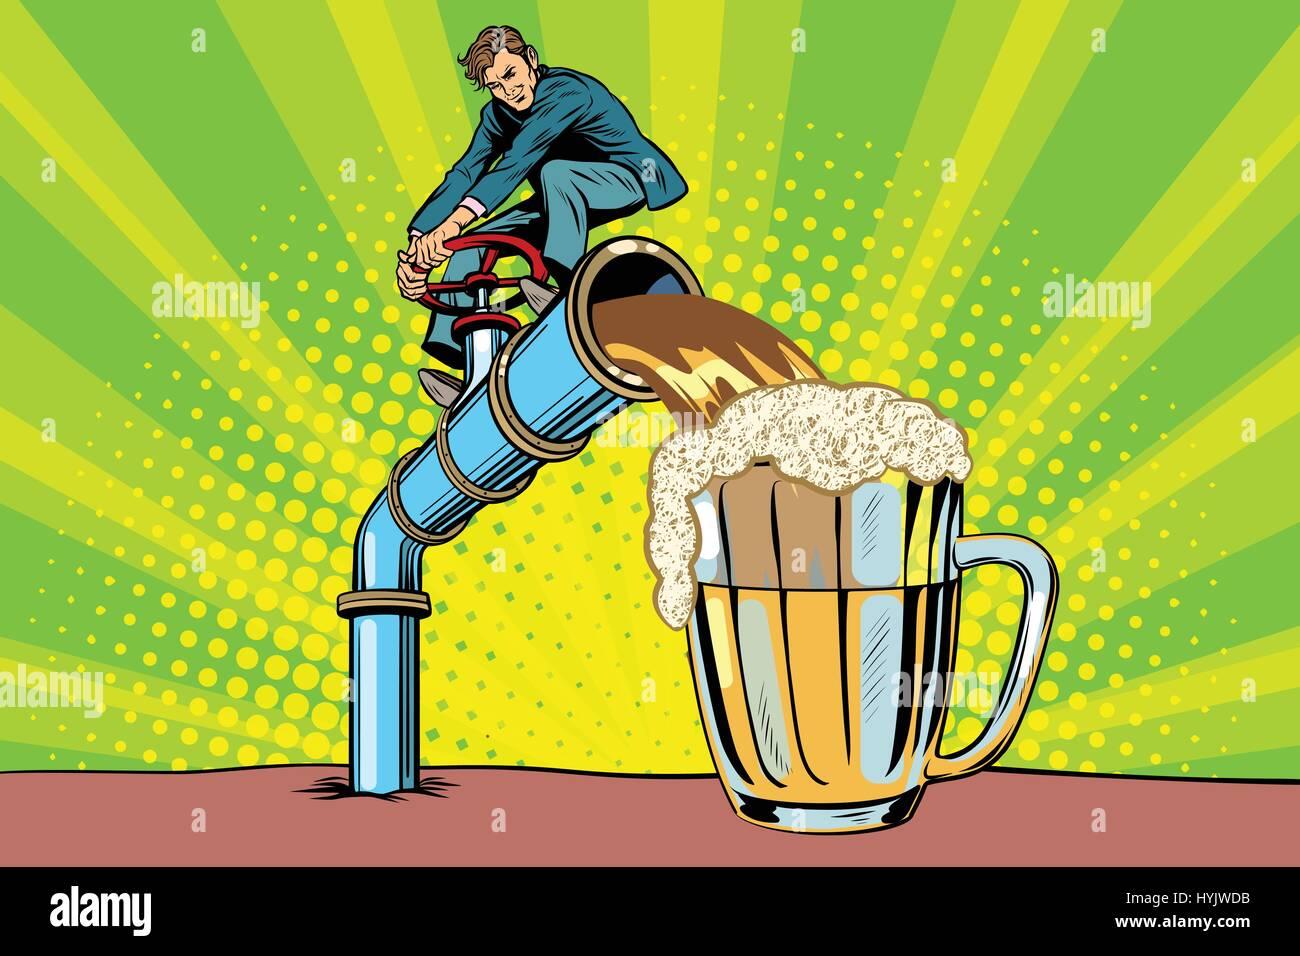 Man pours beer - Stock Vector